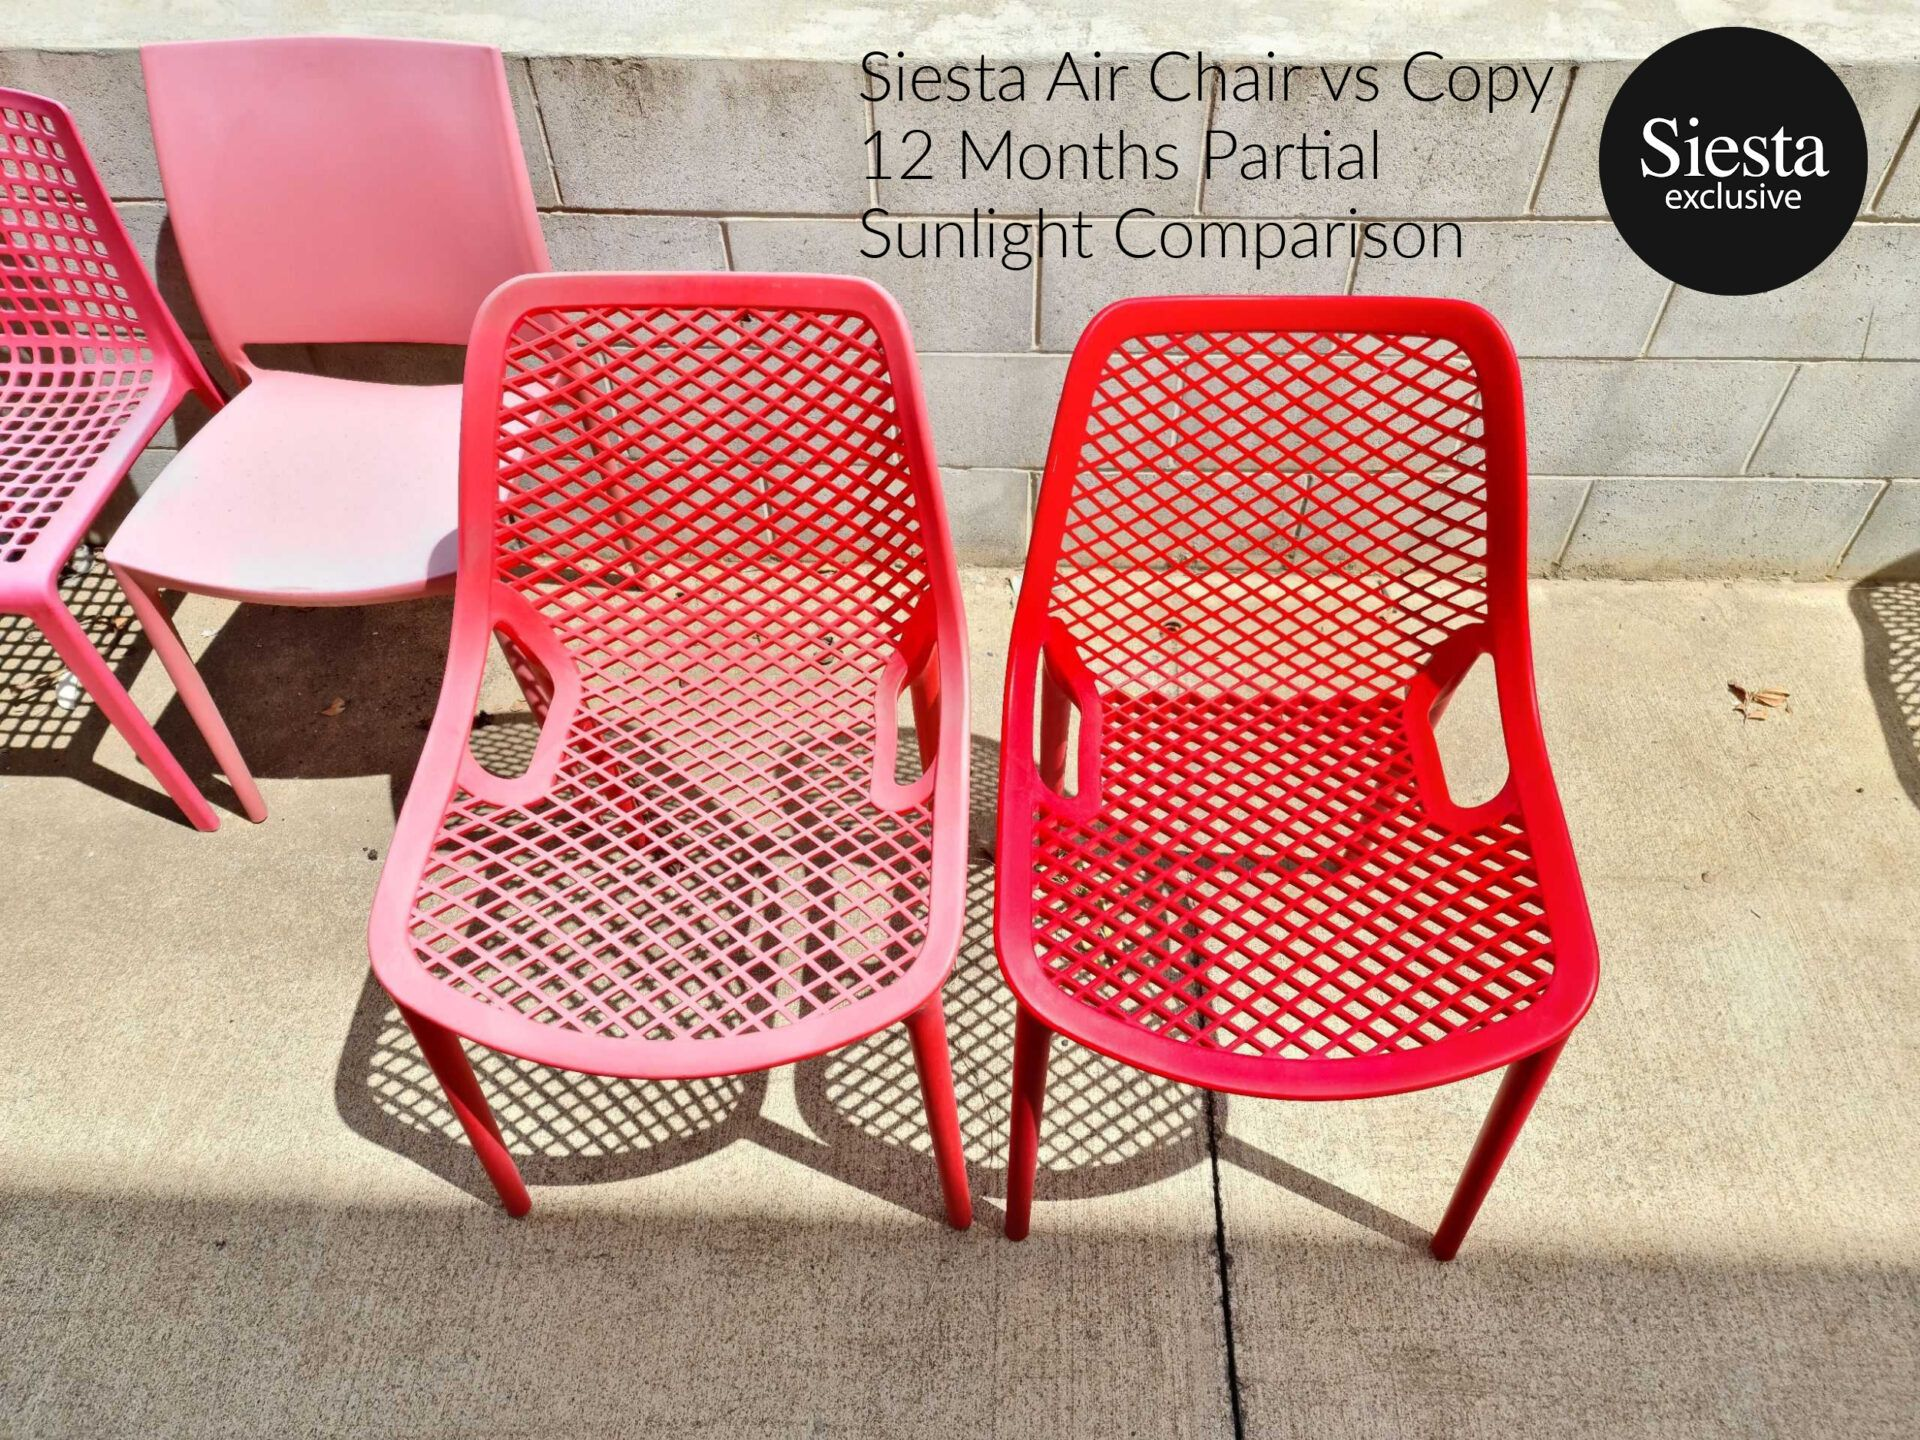 siesta air chair genuine vs copy and replica partial sunlight comparison 12 months 1.1 1